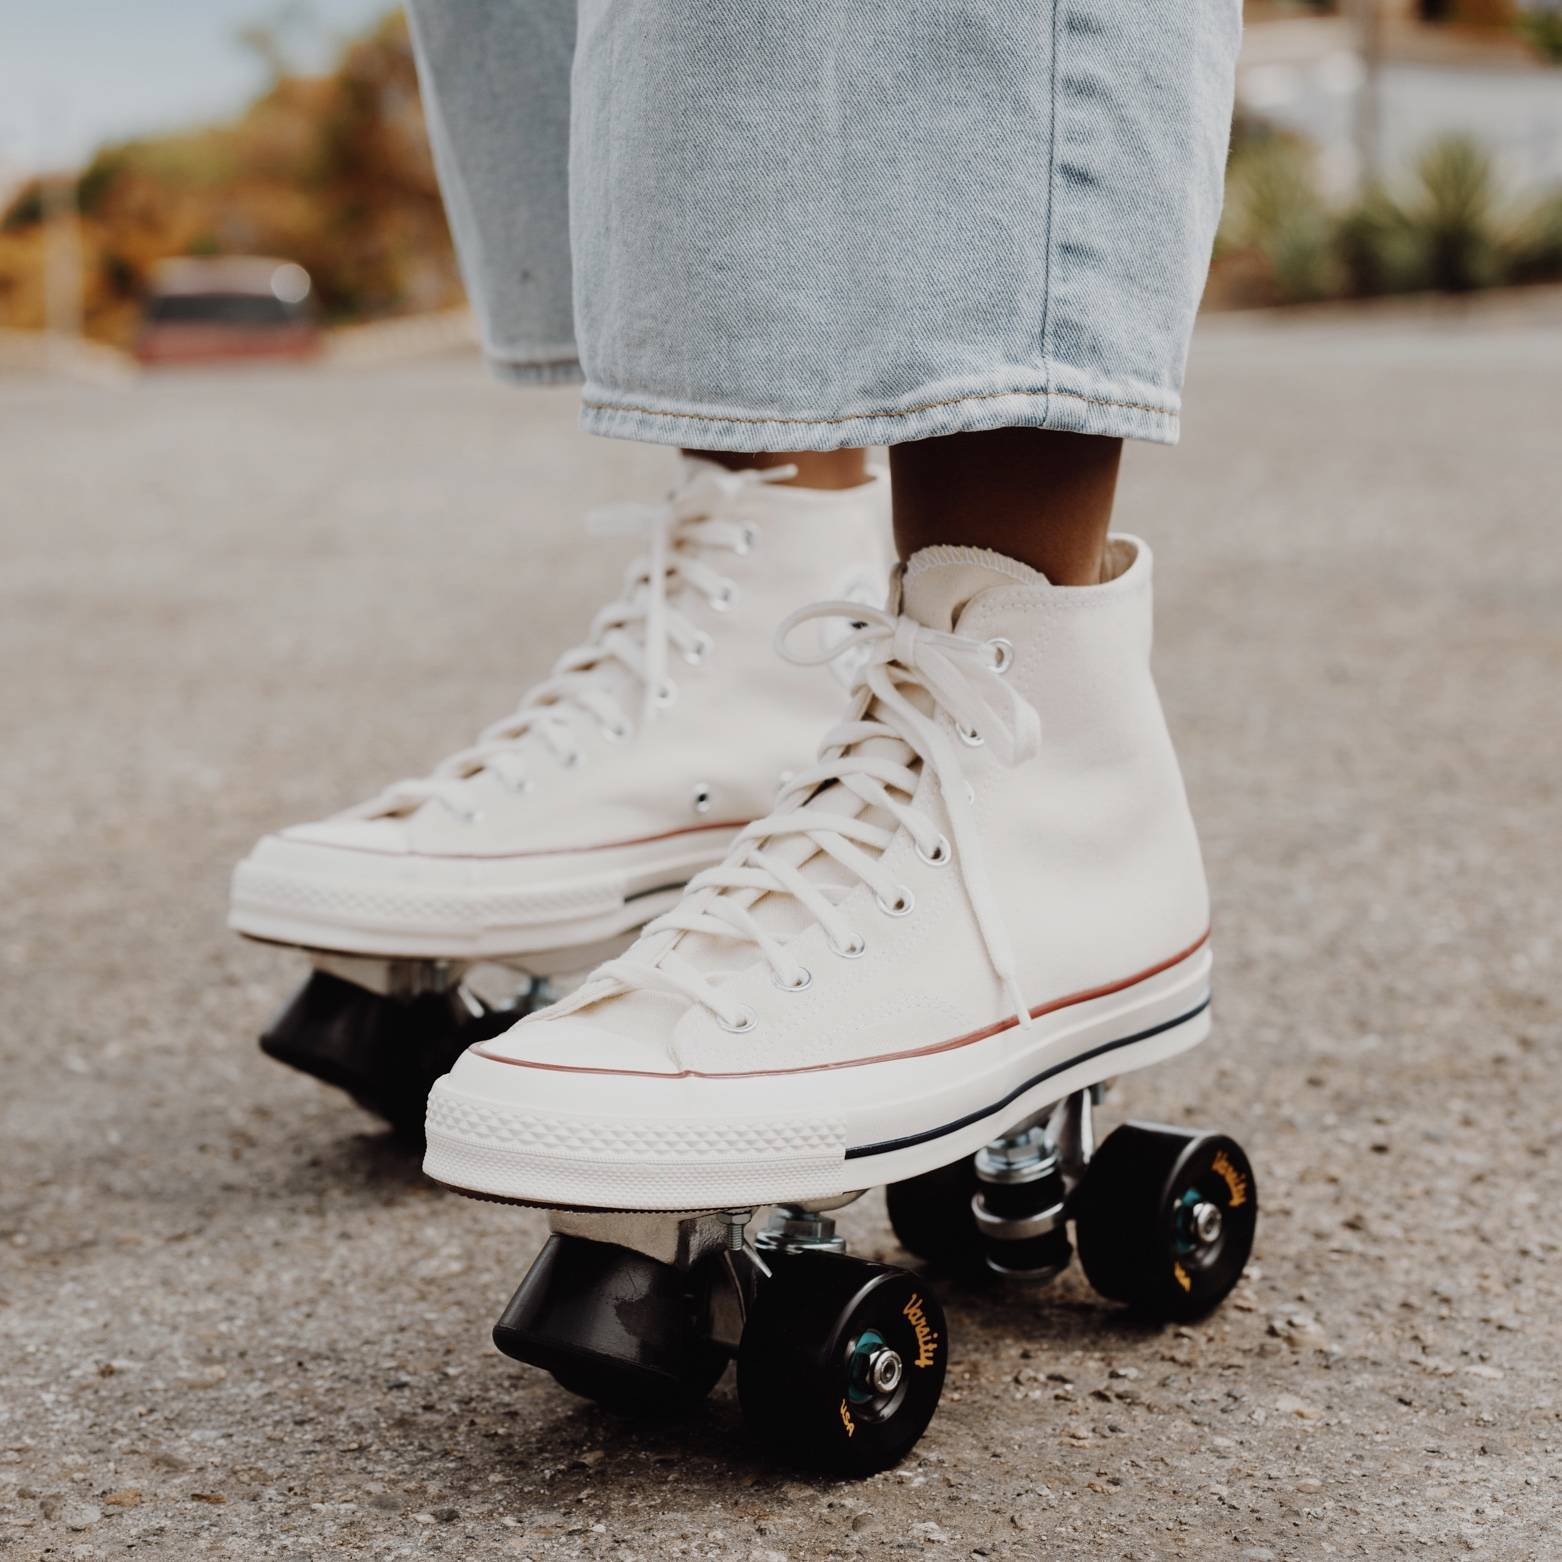 white converse roller skates